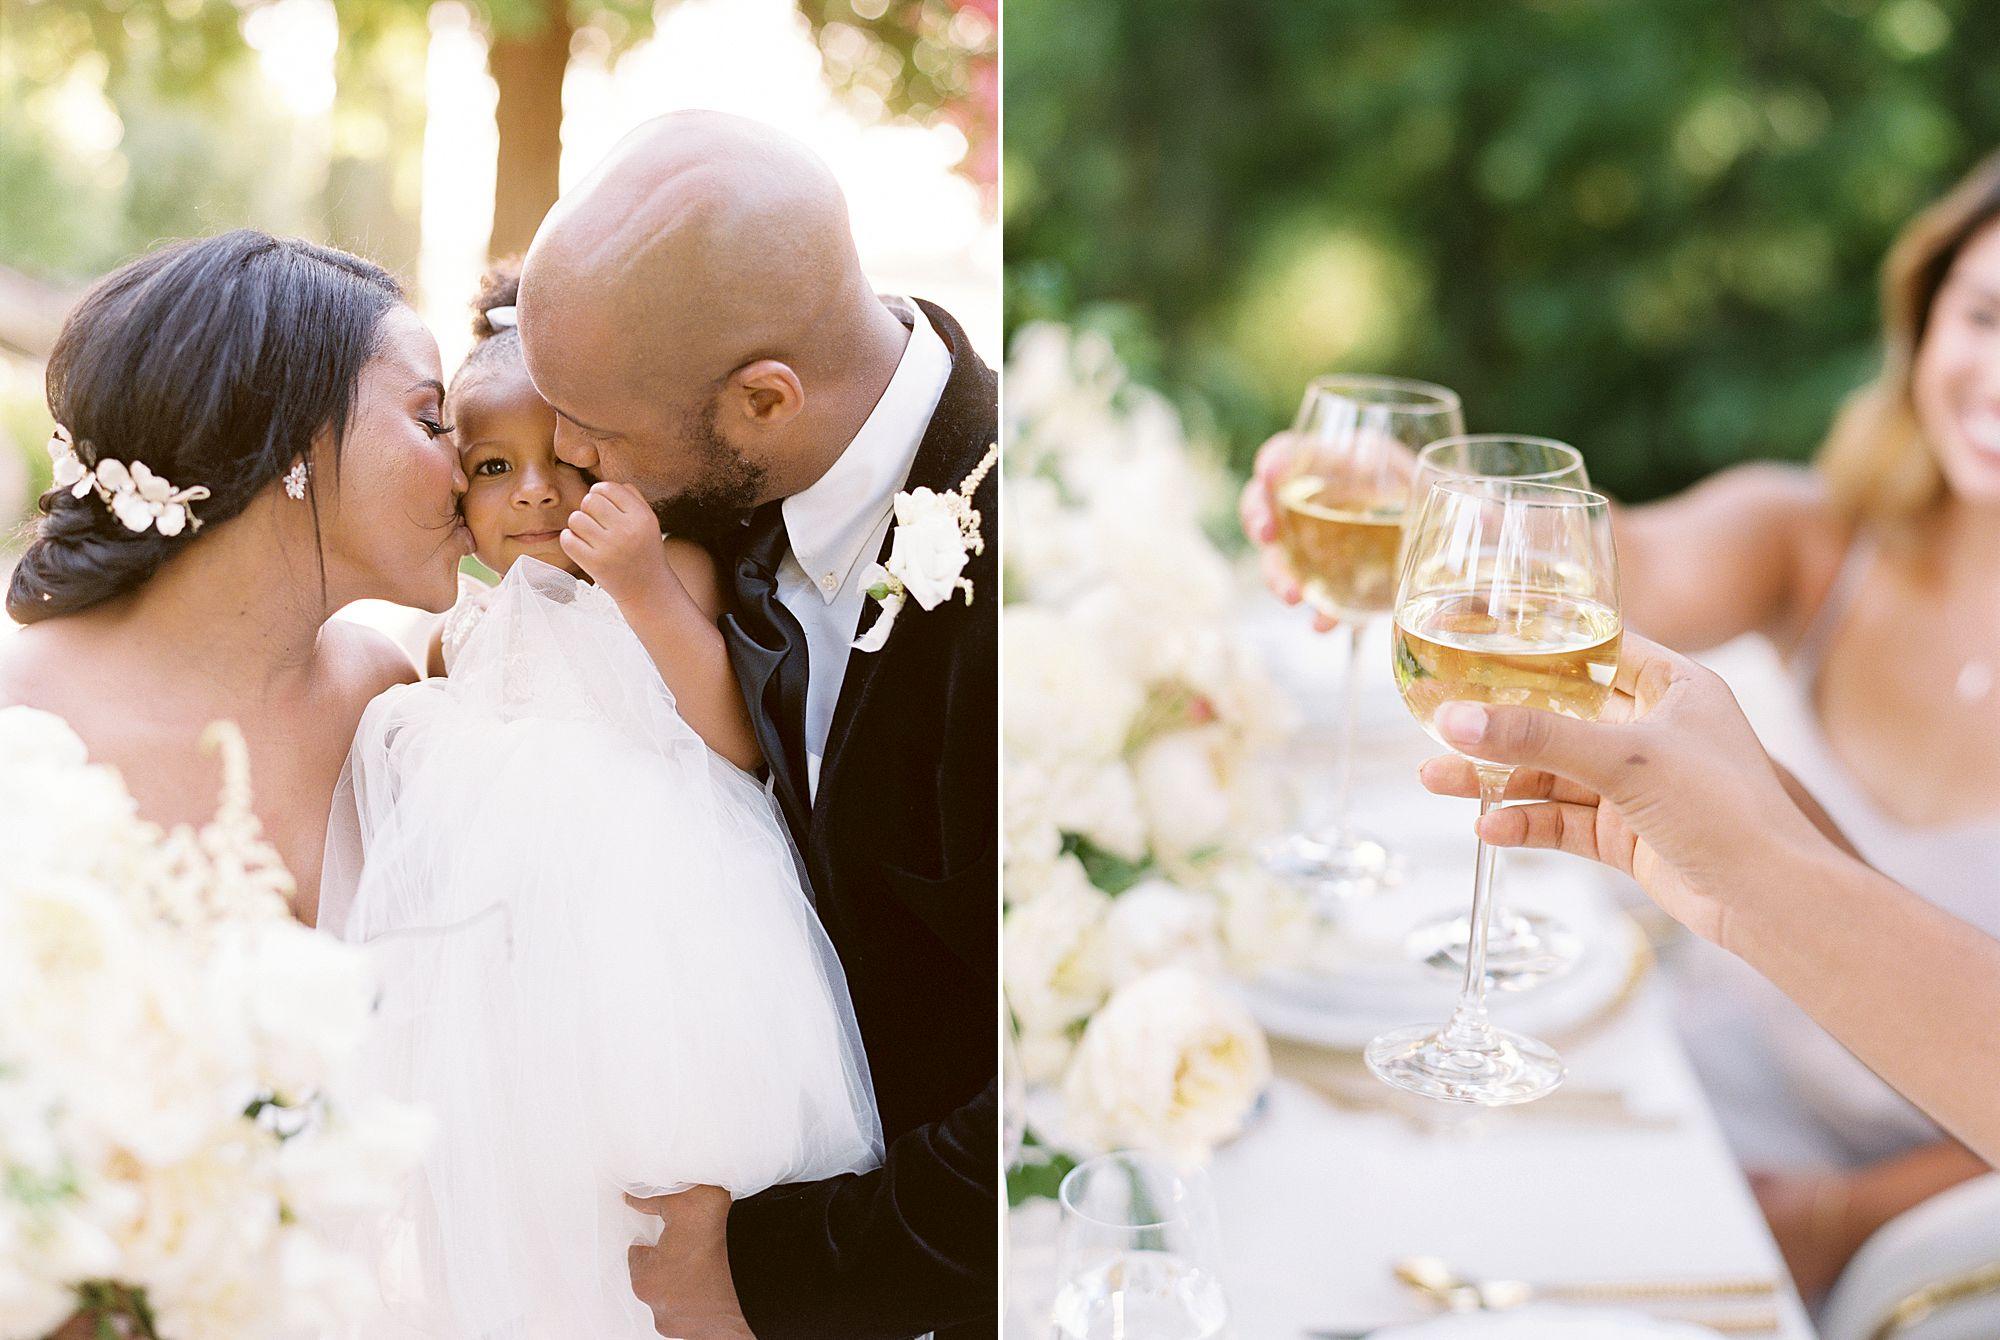 Park Winters Micro-Wedding Inspiration on Style Me Pretty - Stephanie Teague Events - Ashley Baumgartner - Park Winters Wedding - Black Tie Wedding - Micro-Wedding Sacramento Photographer_0051.jpg